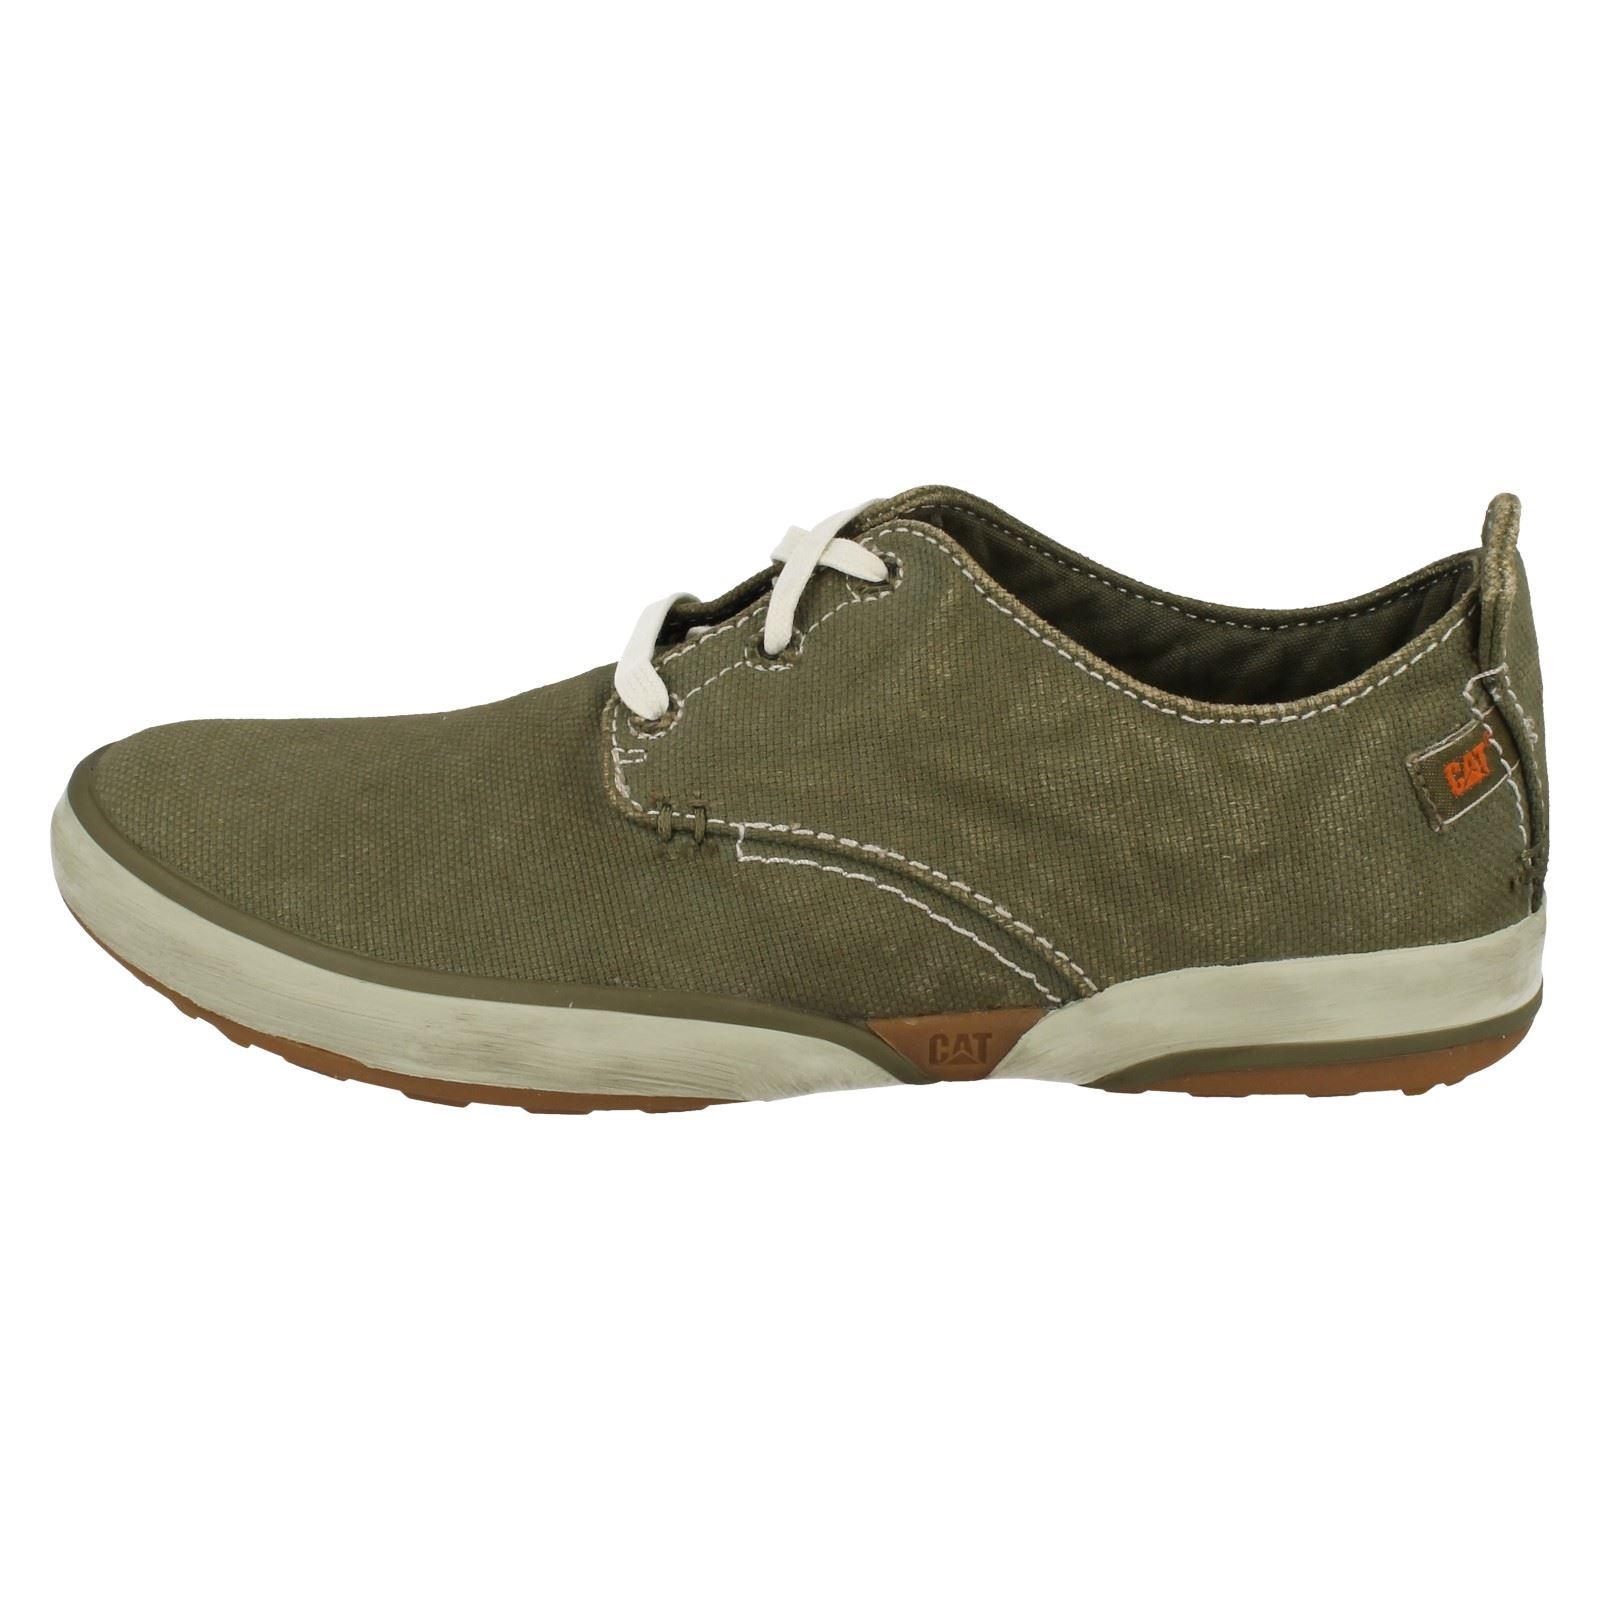 Shoes Casual Hedge verde Caterpillar Canvas Status Oxford Mens 'p713671' q7t5aBF